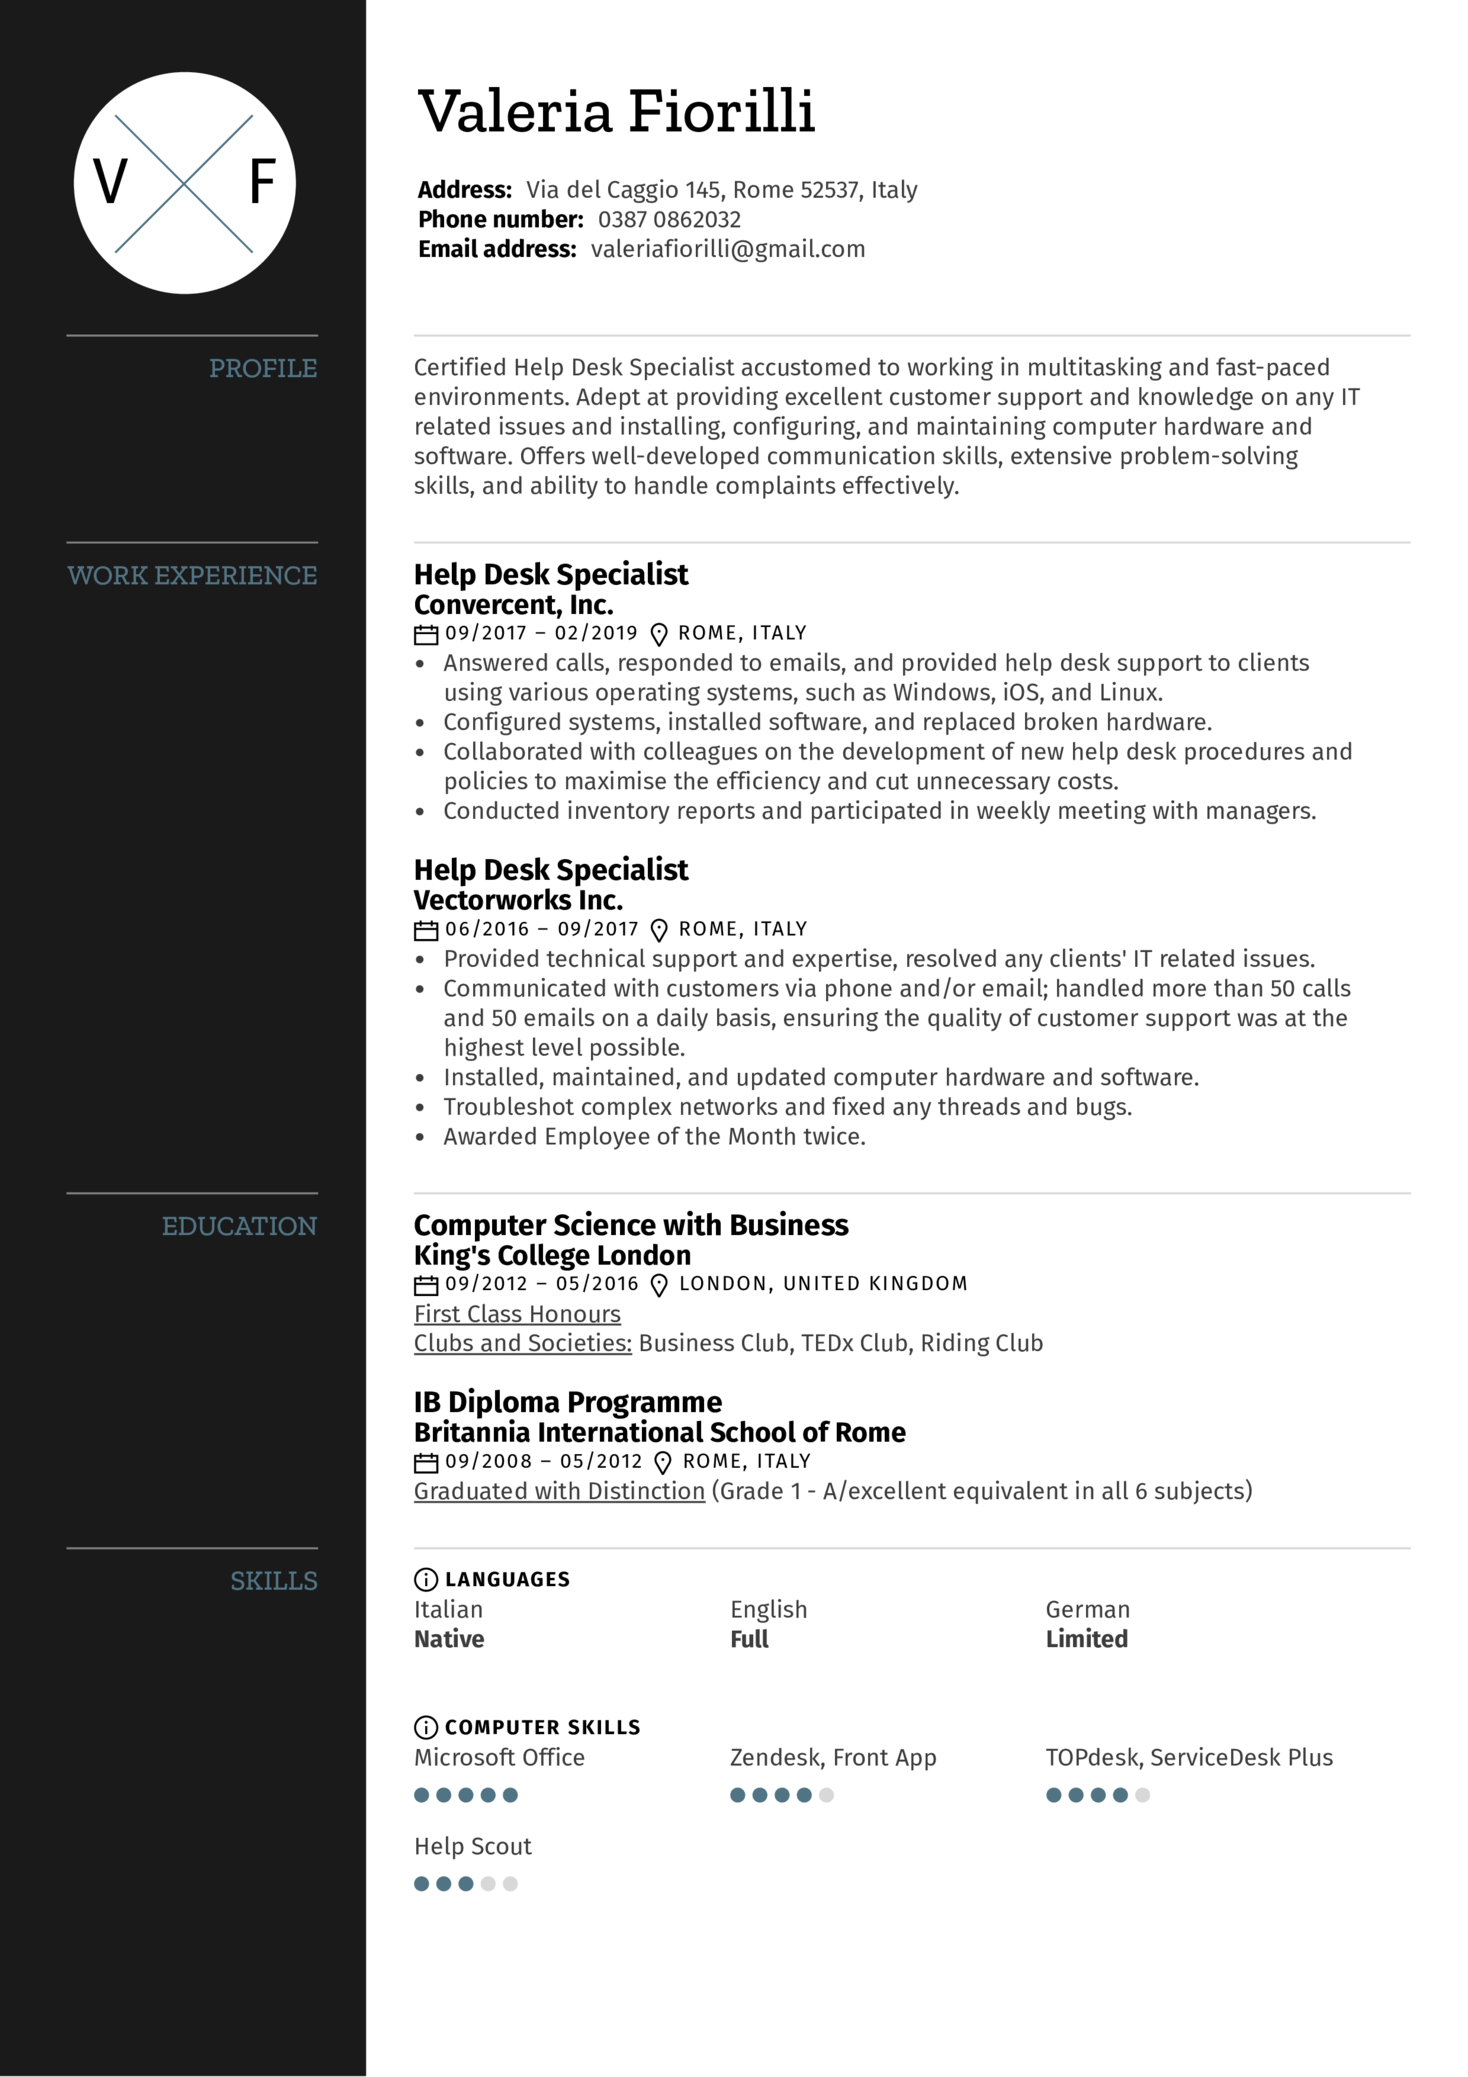 Help Desk Specialist Resume Sample (Part 1)